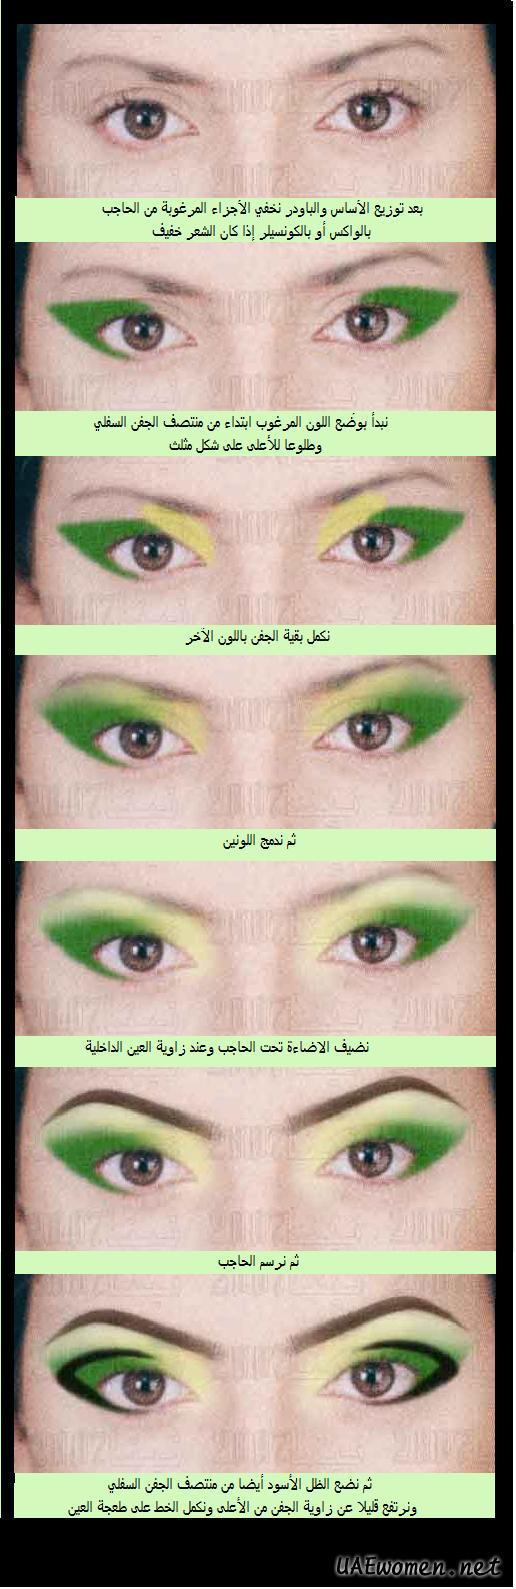 Lita007 Guest. Re  Tutorial Maquillage Libanais